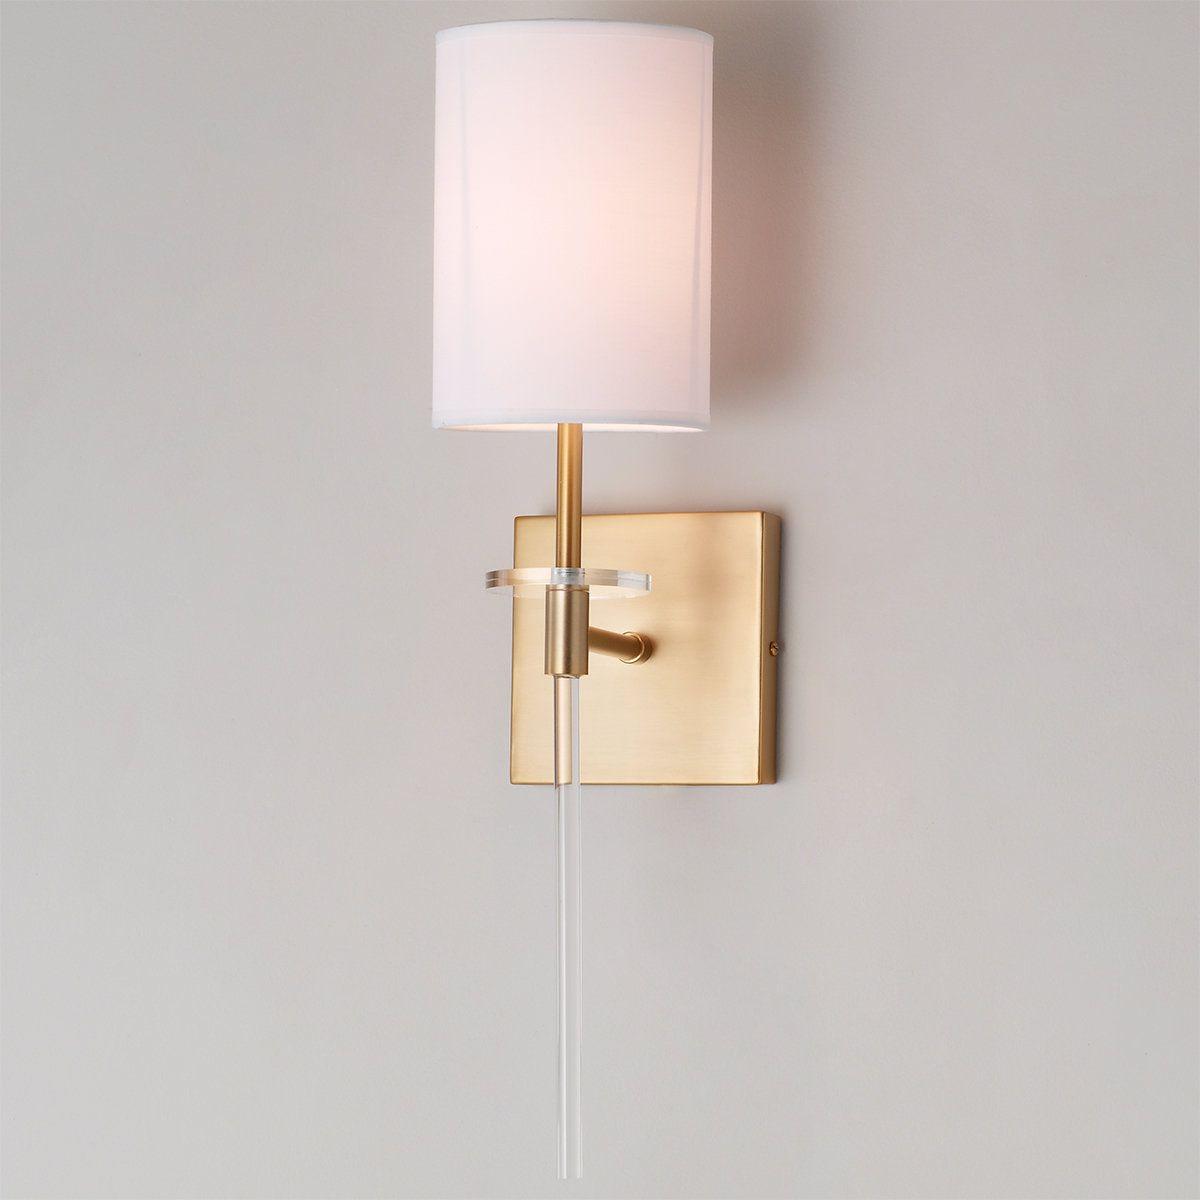 Acrylic Bobeche Sconce 1 Light In 2020 Sconces Brass